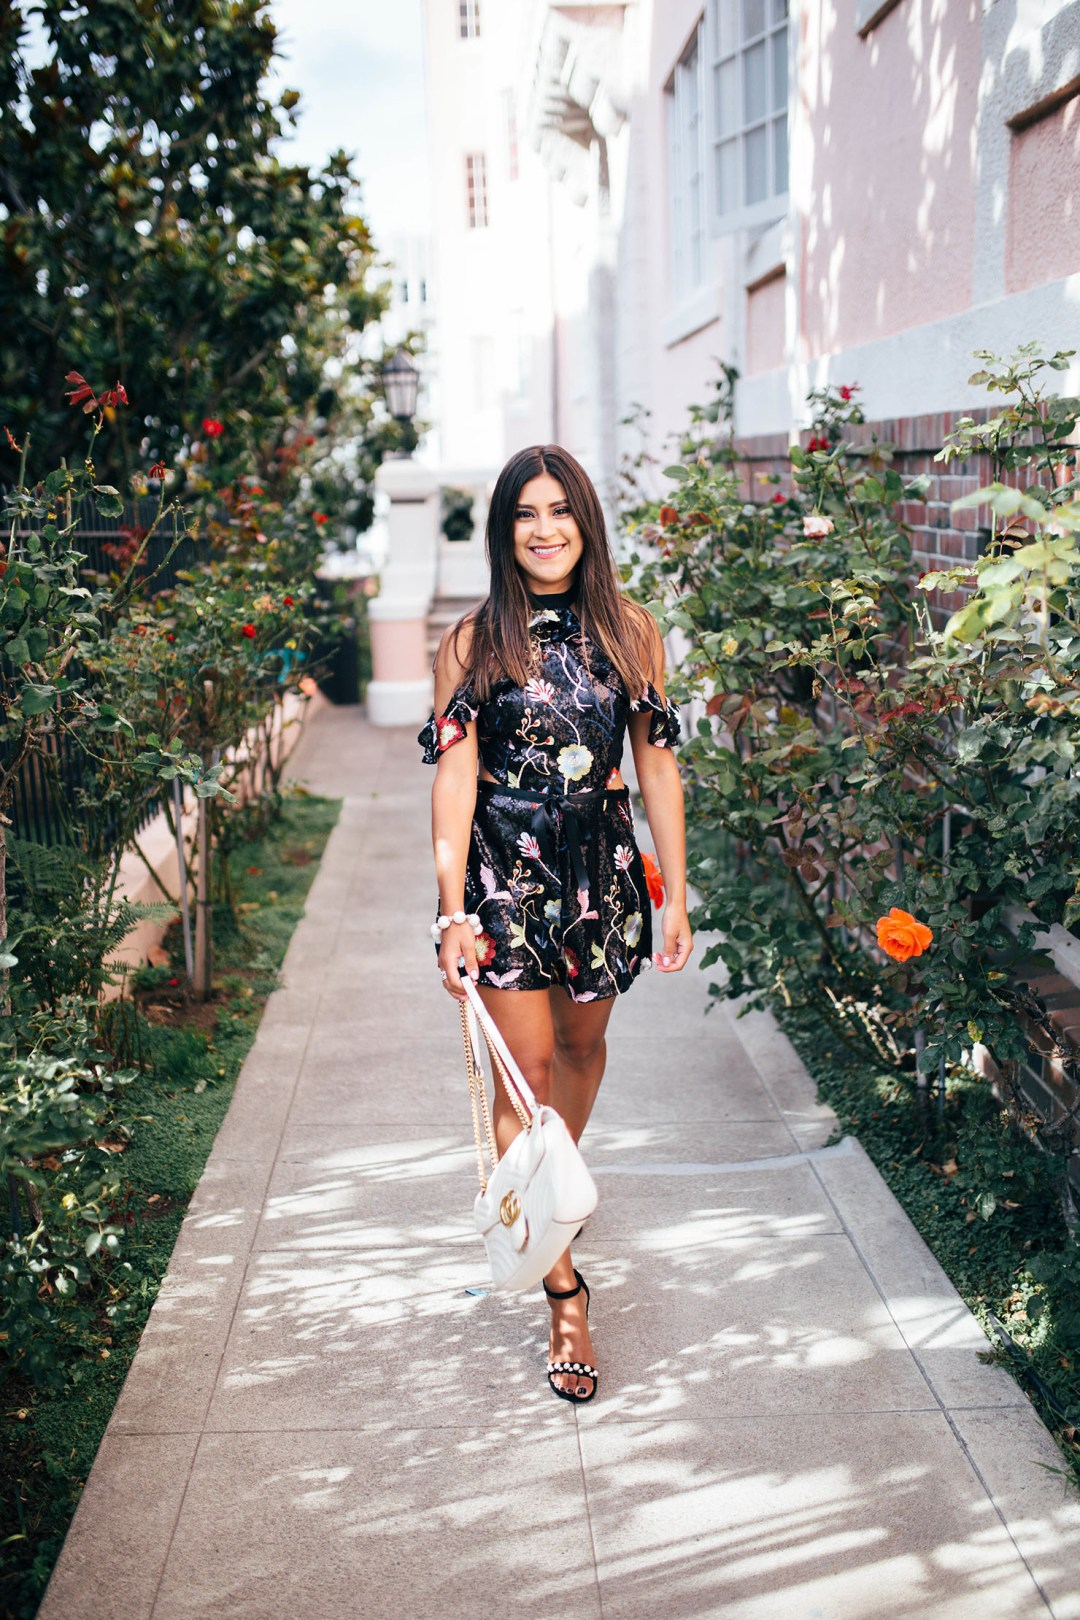 Lifestyle blogger, Kelsey Kaplan of Kelsey Kaplan Fashion wearing sequin romper and pearl Stuart Weitzman sandals